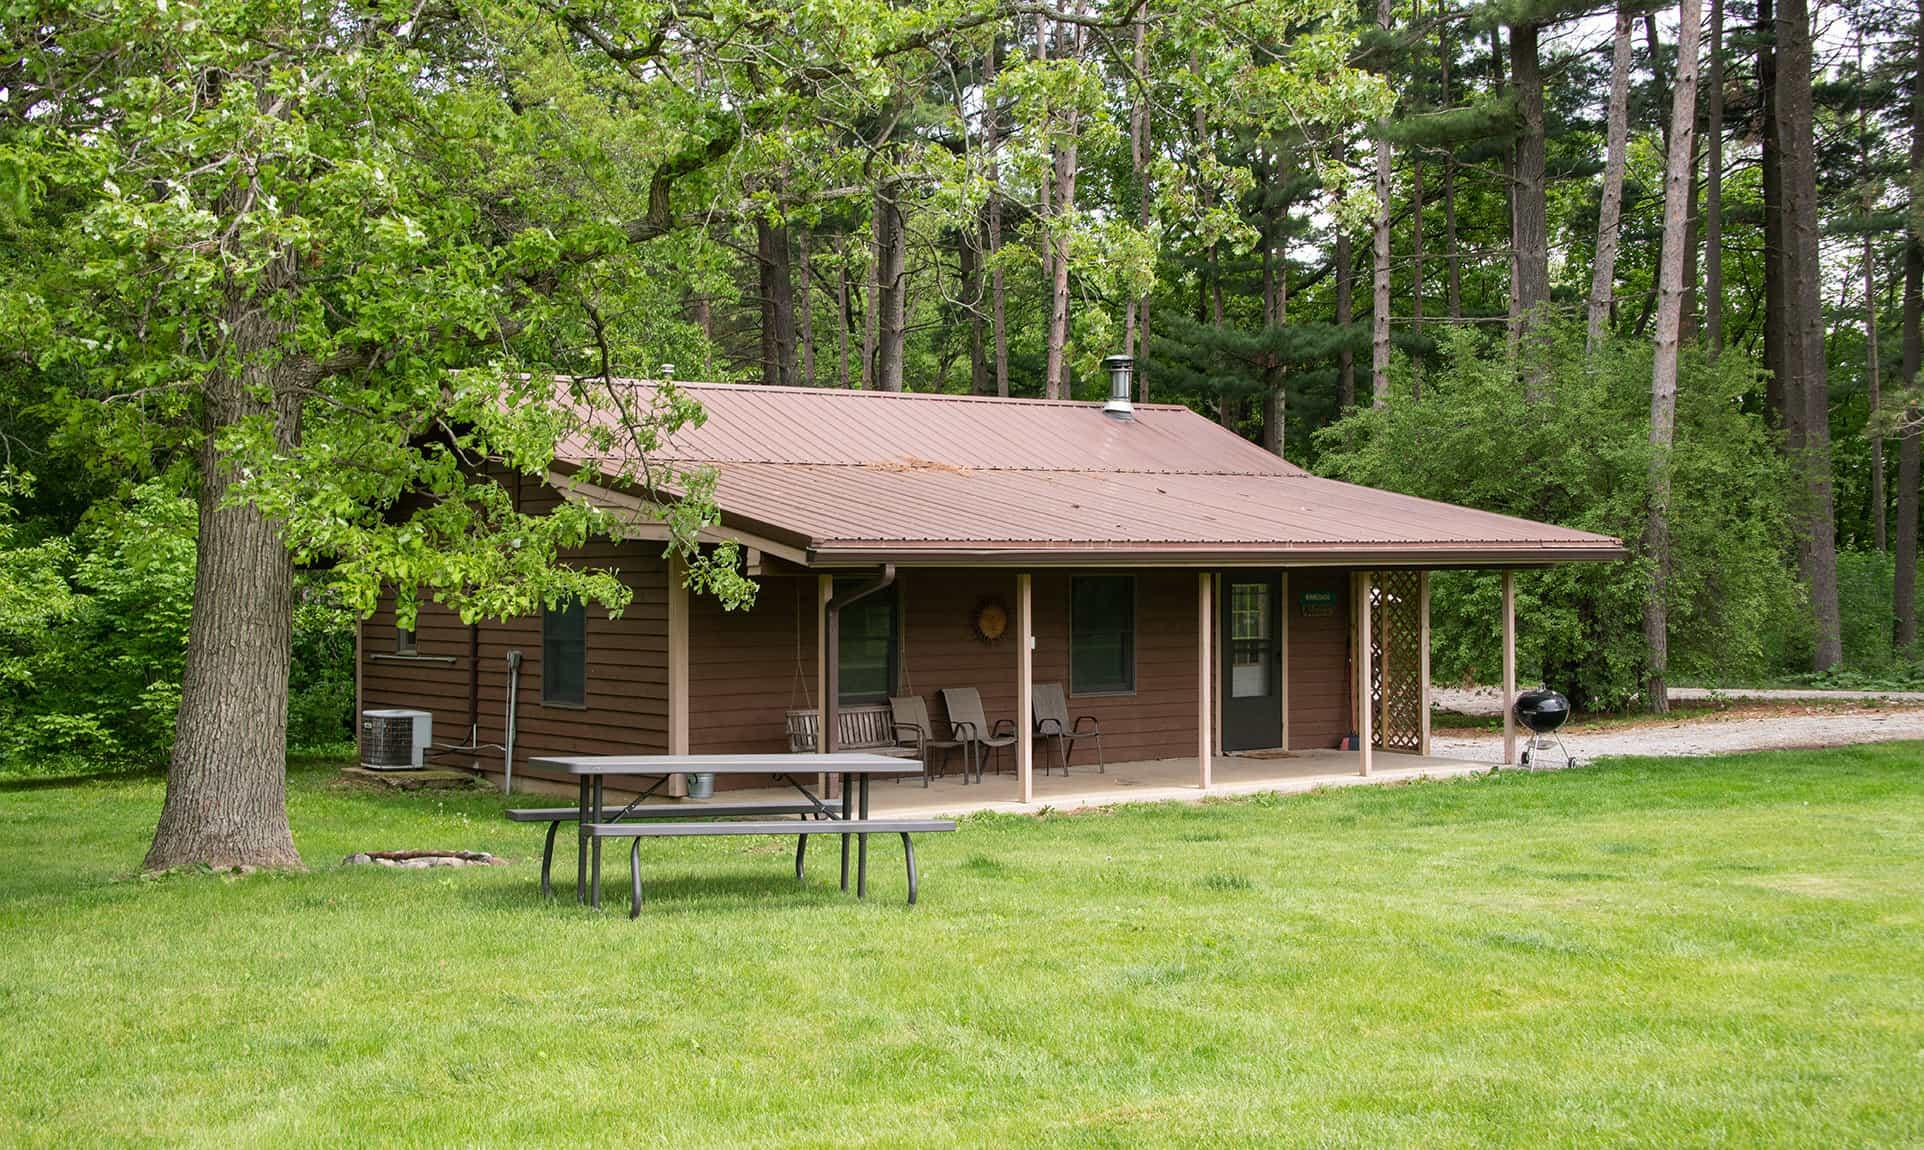 Winnebago Cabin exterior